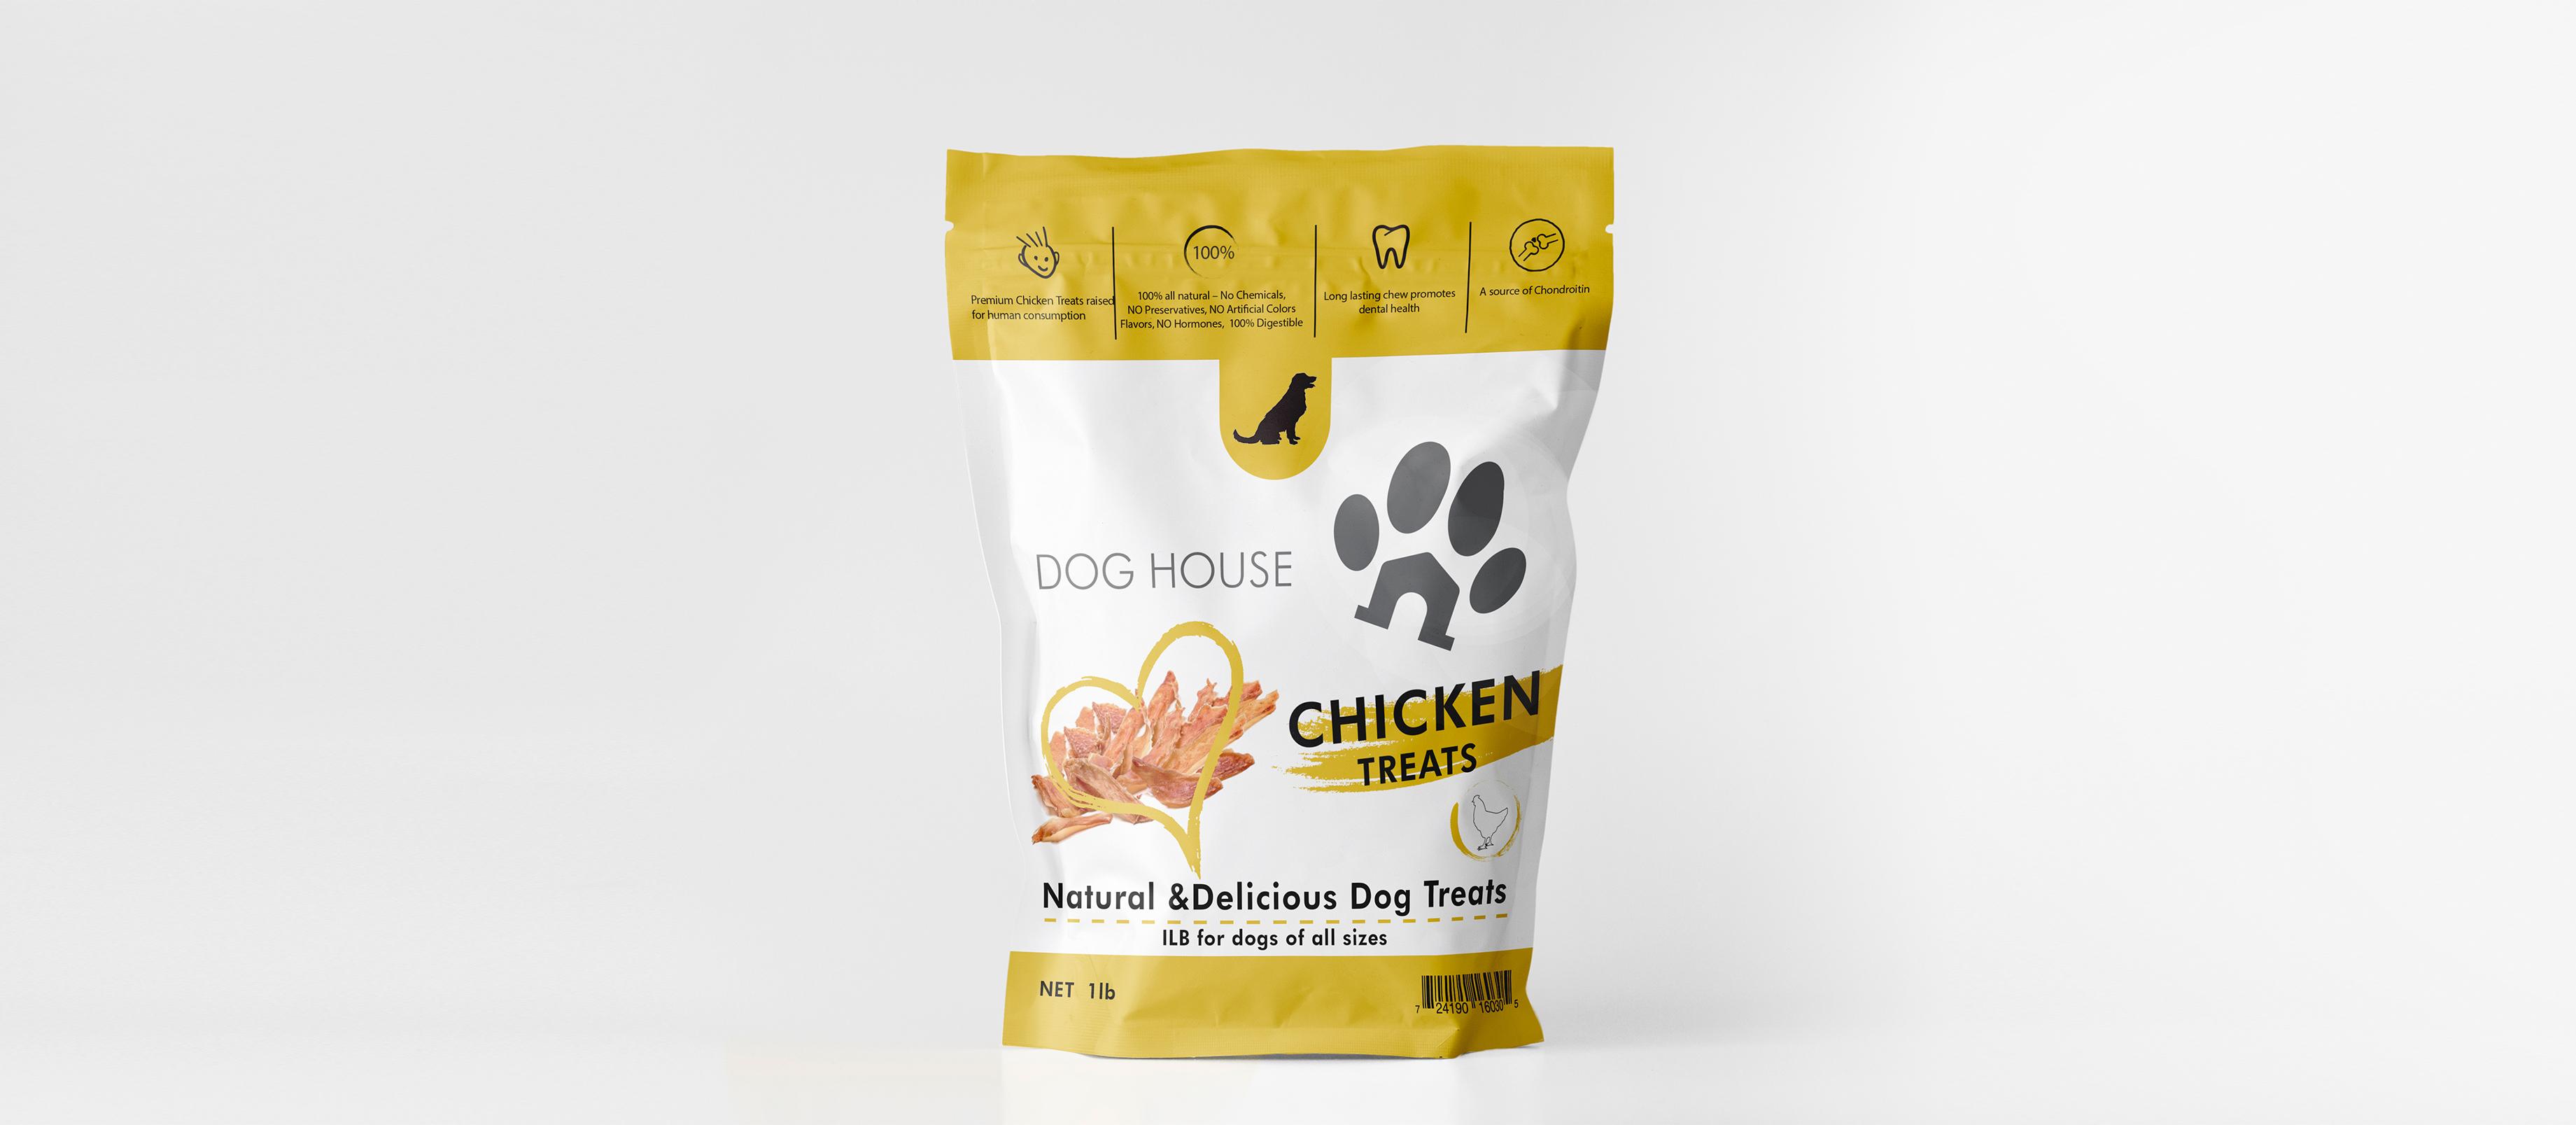 Food for dogs identity design, web design , logo, business cards, https://www.behance.net/andonov